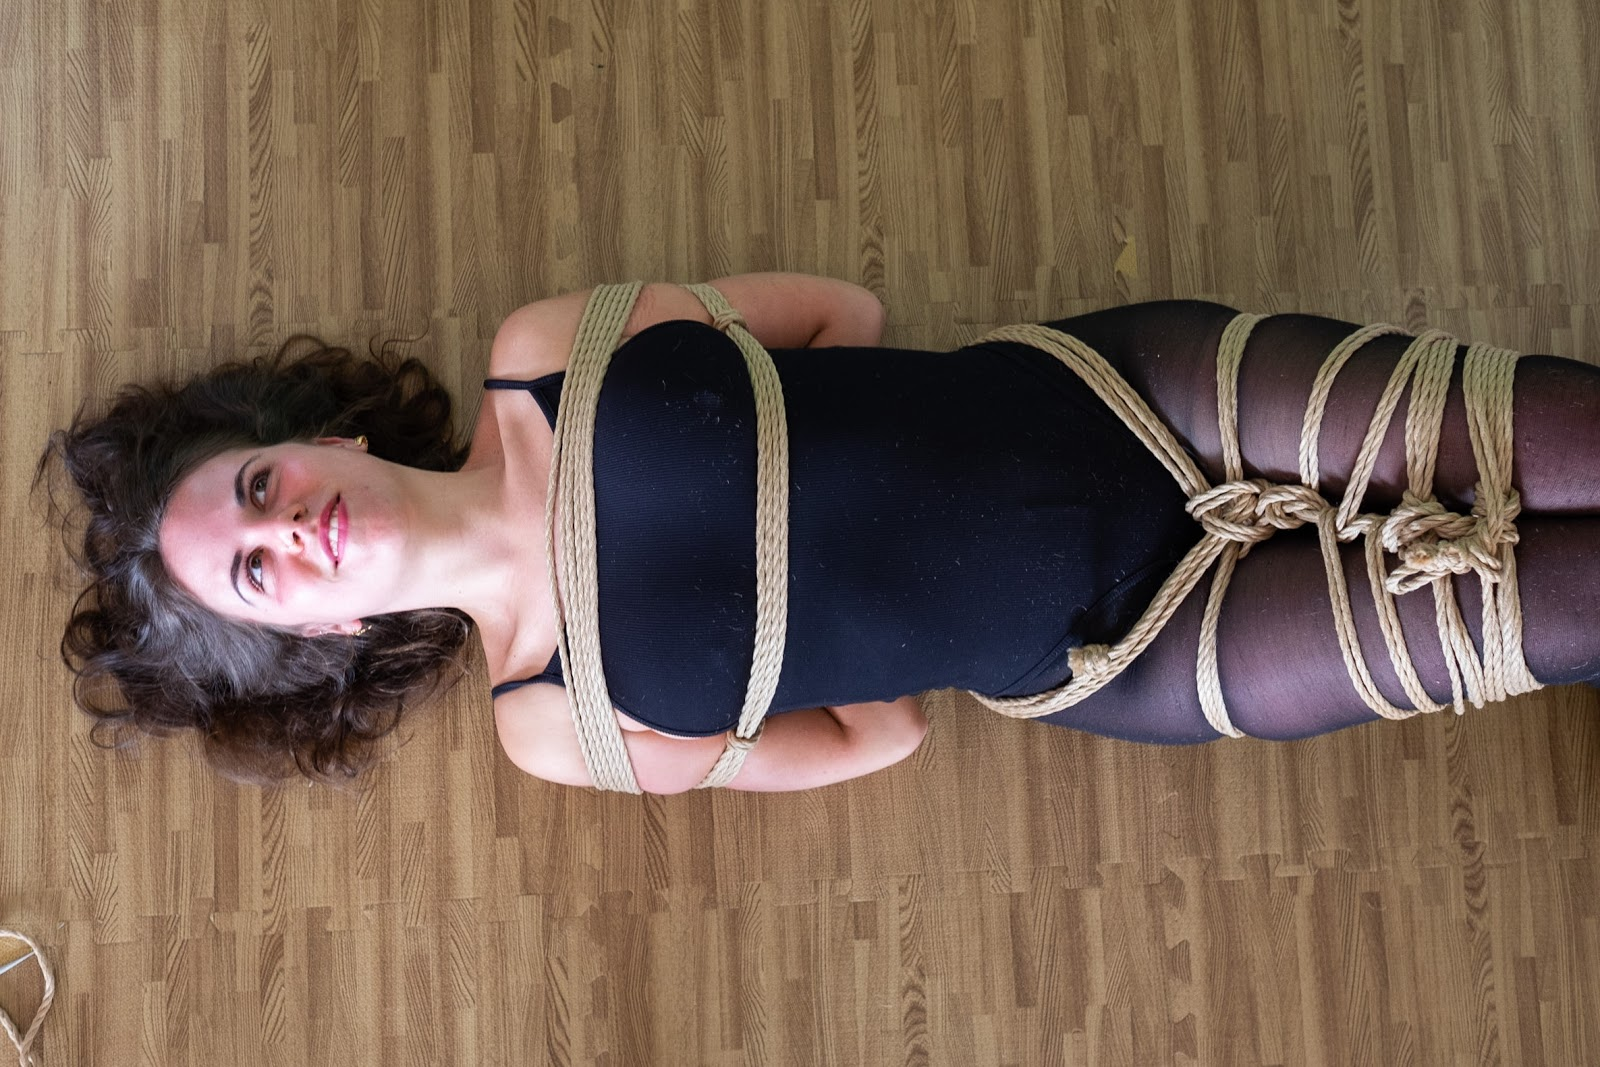 Women giving anal massage